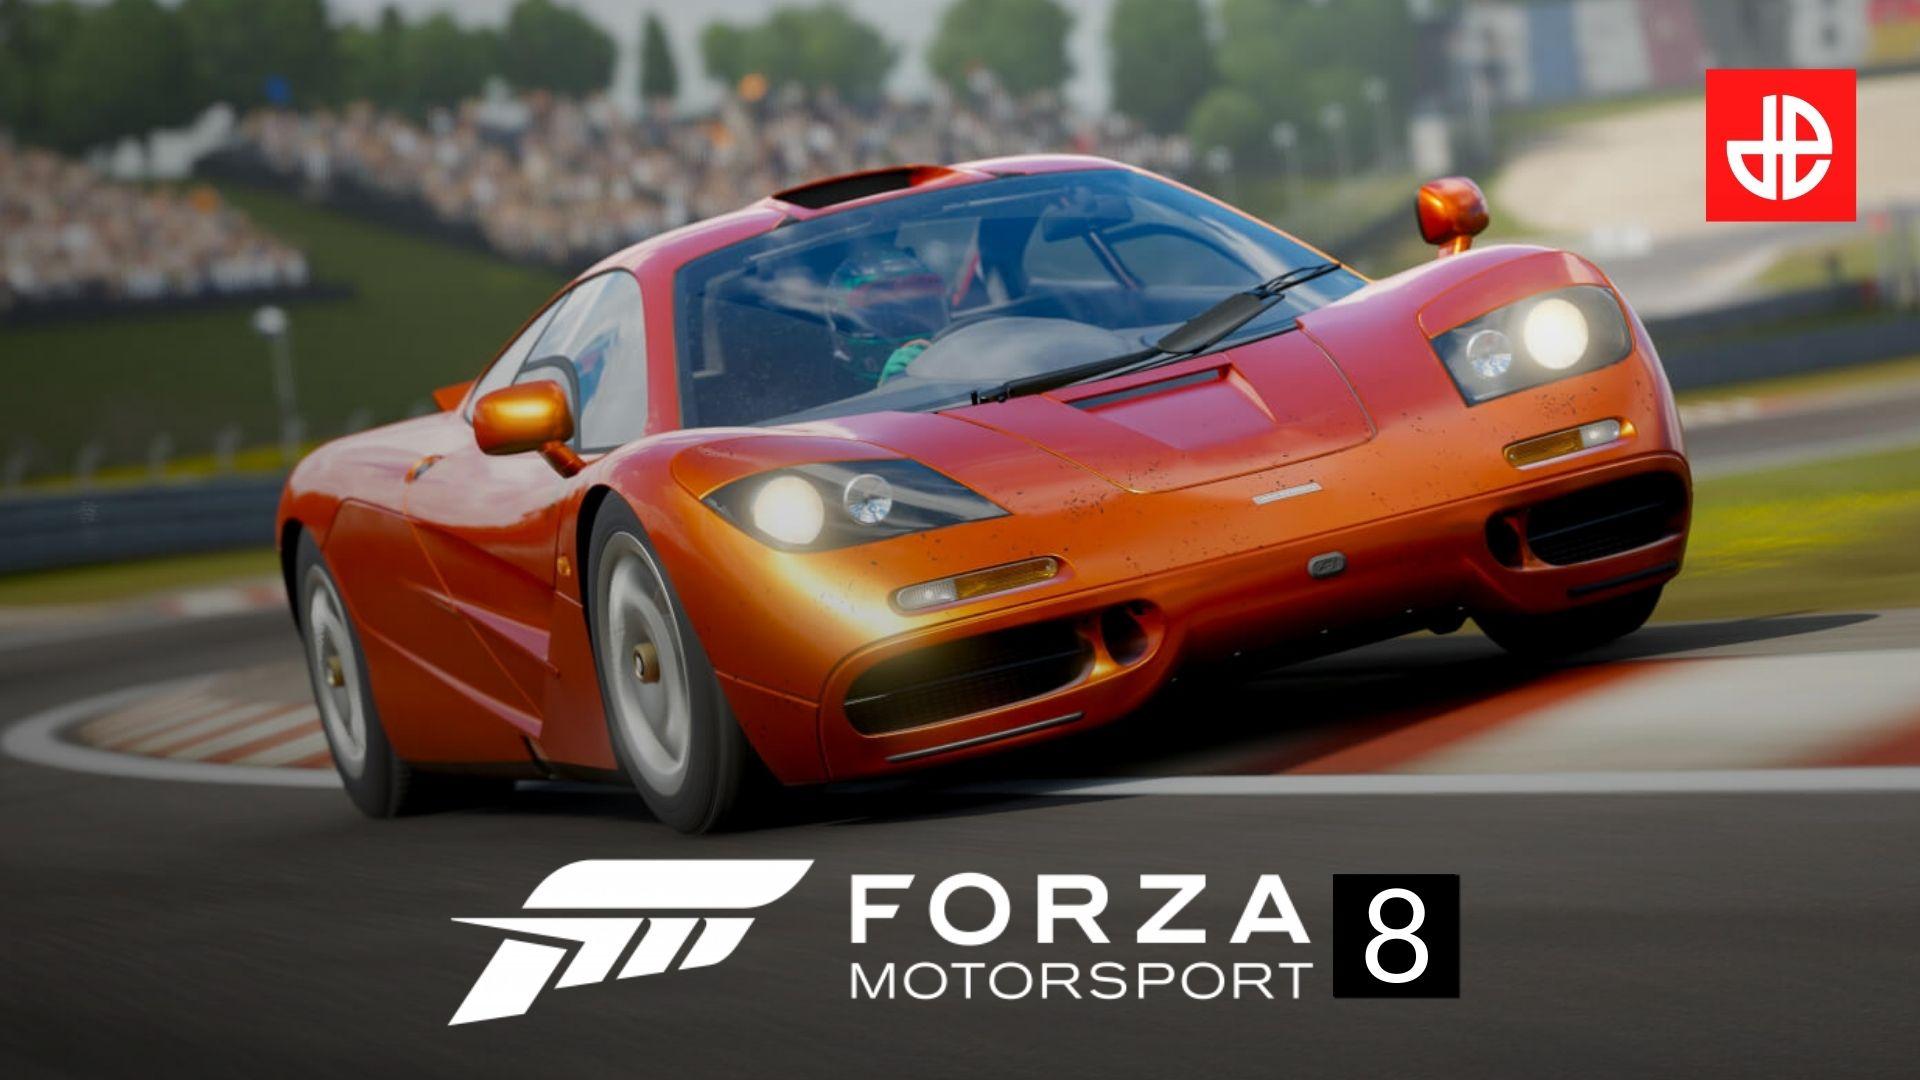 Forza Motorsport 8 car on racetrack